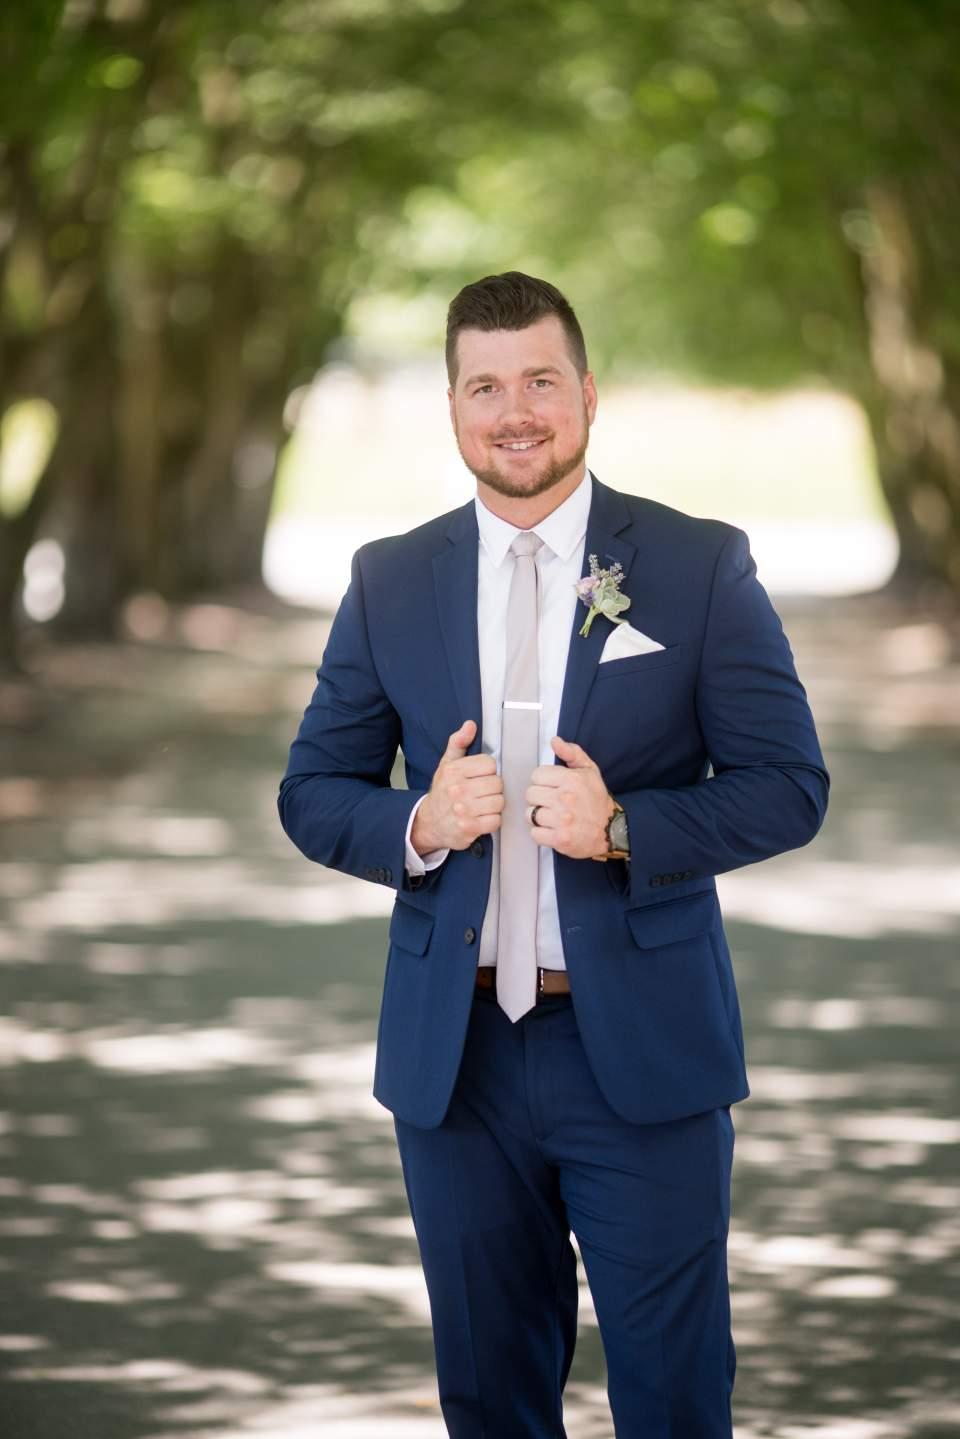 dapper portrait of groom